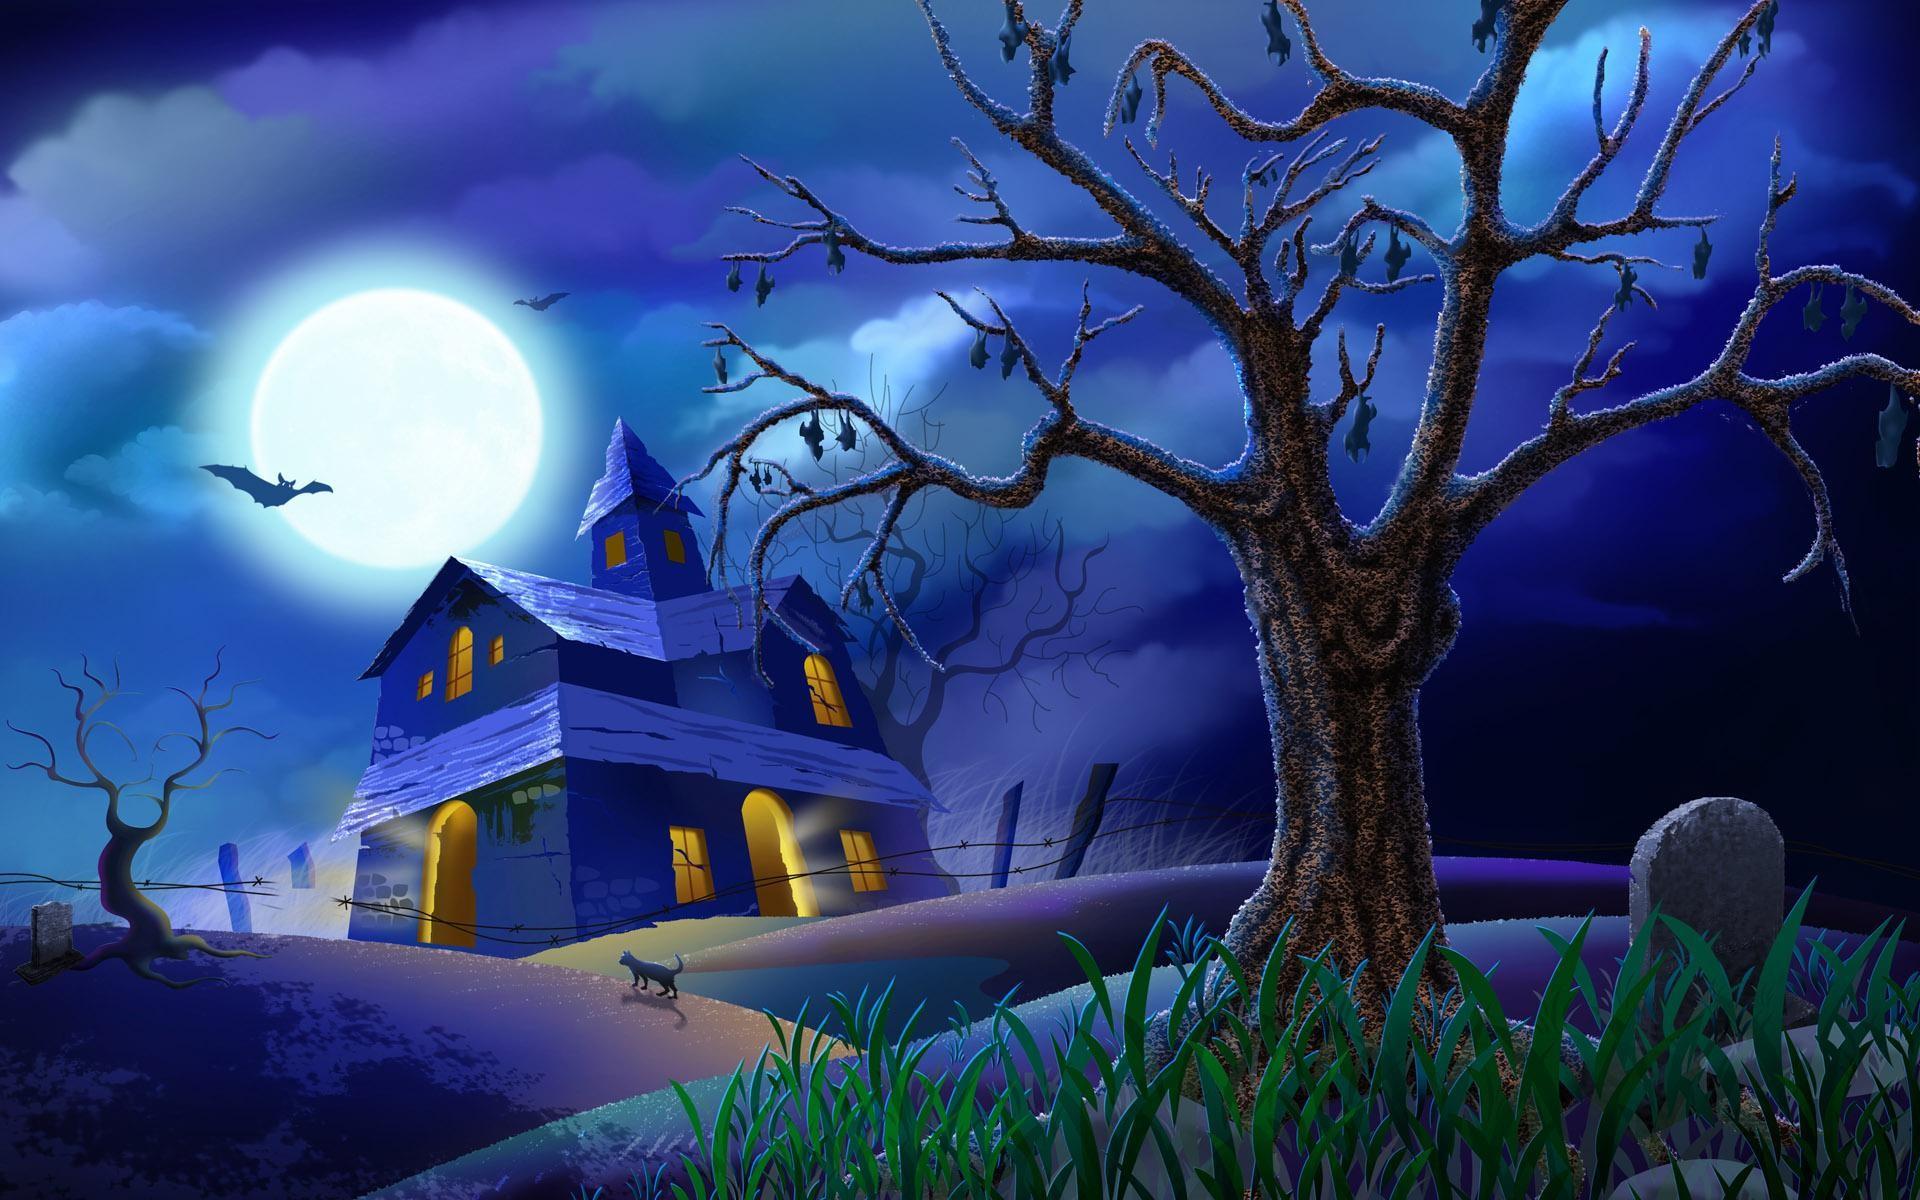 Haunted House Wallpapers Desktop – Wallpaper Cave